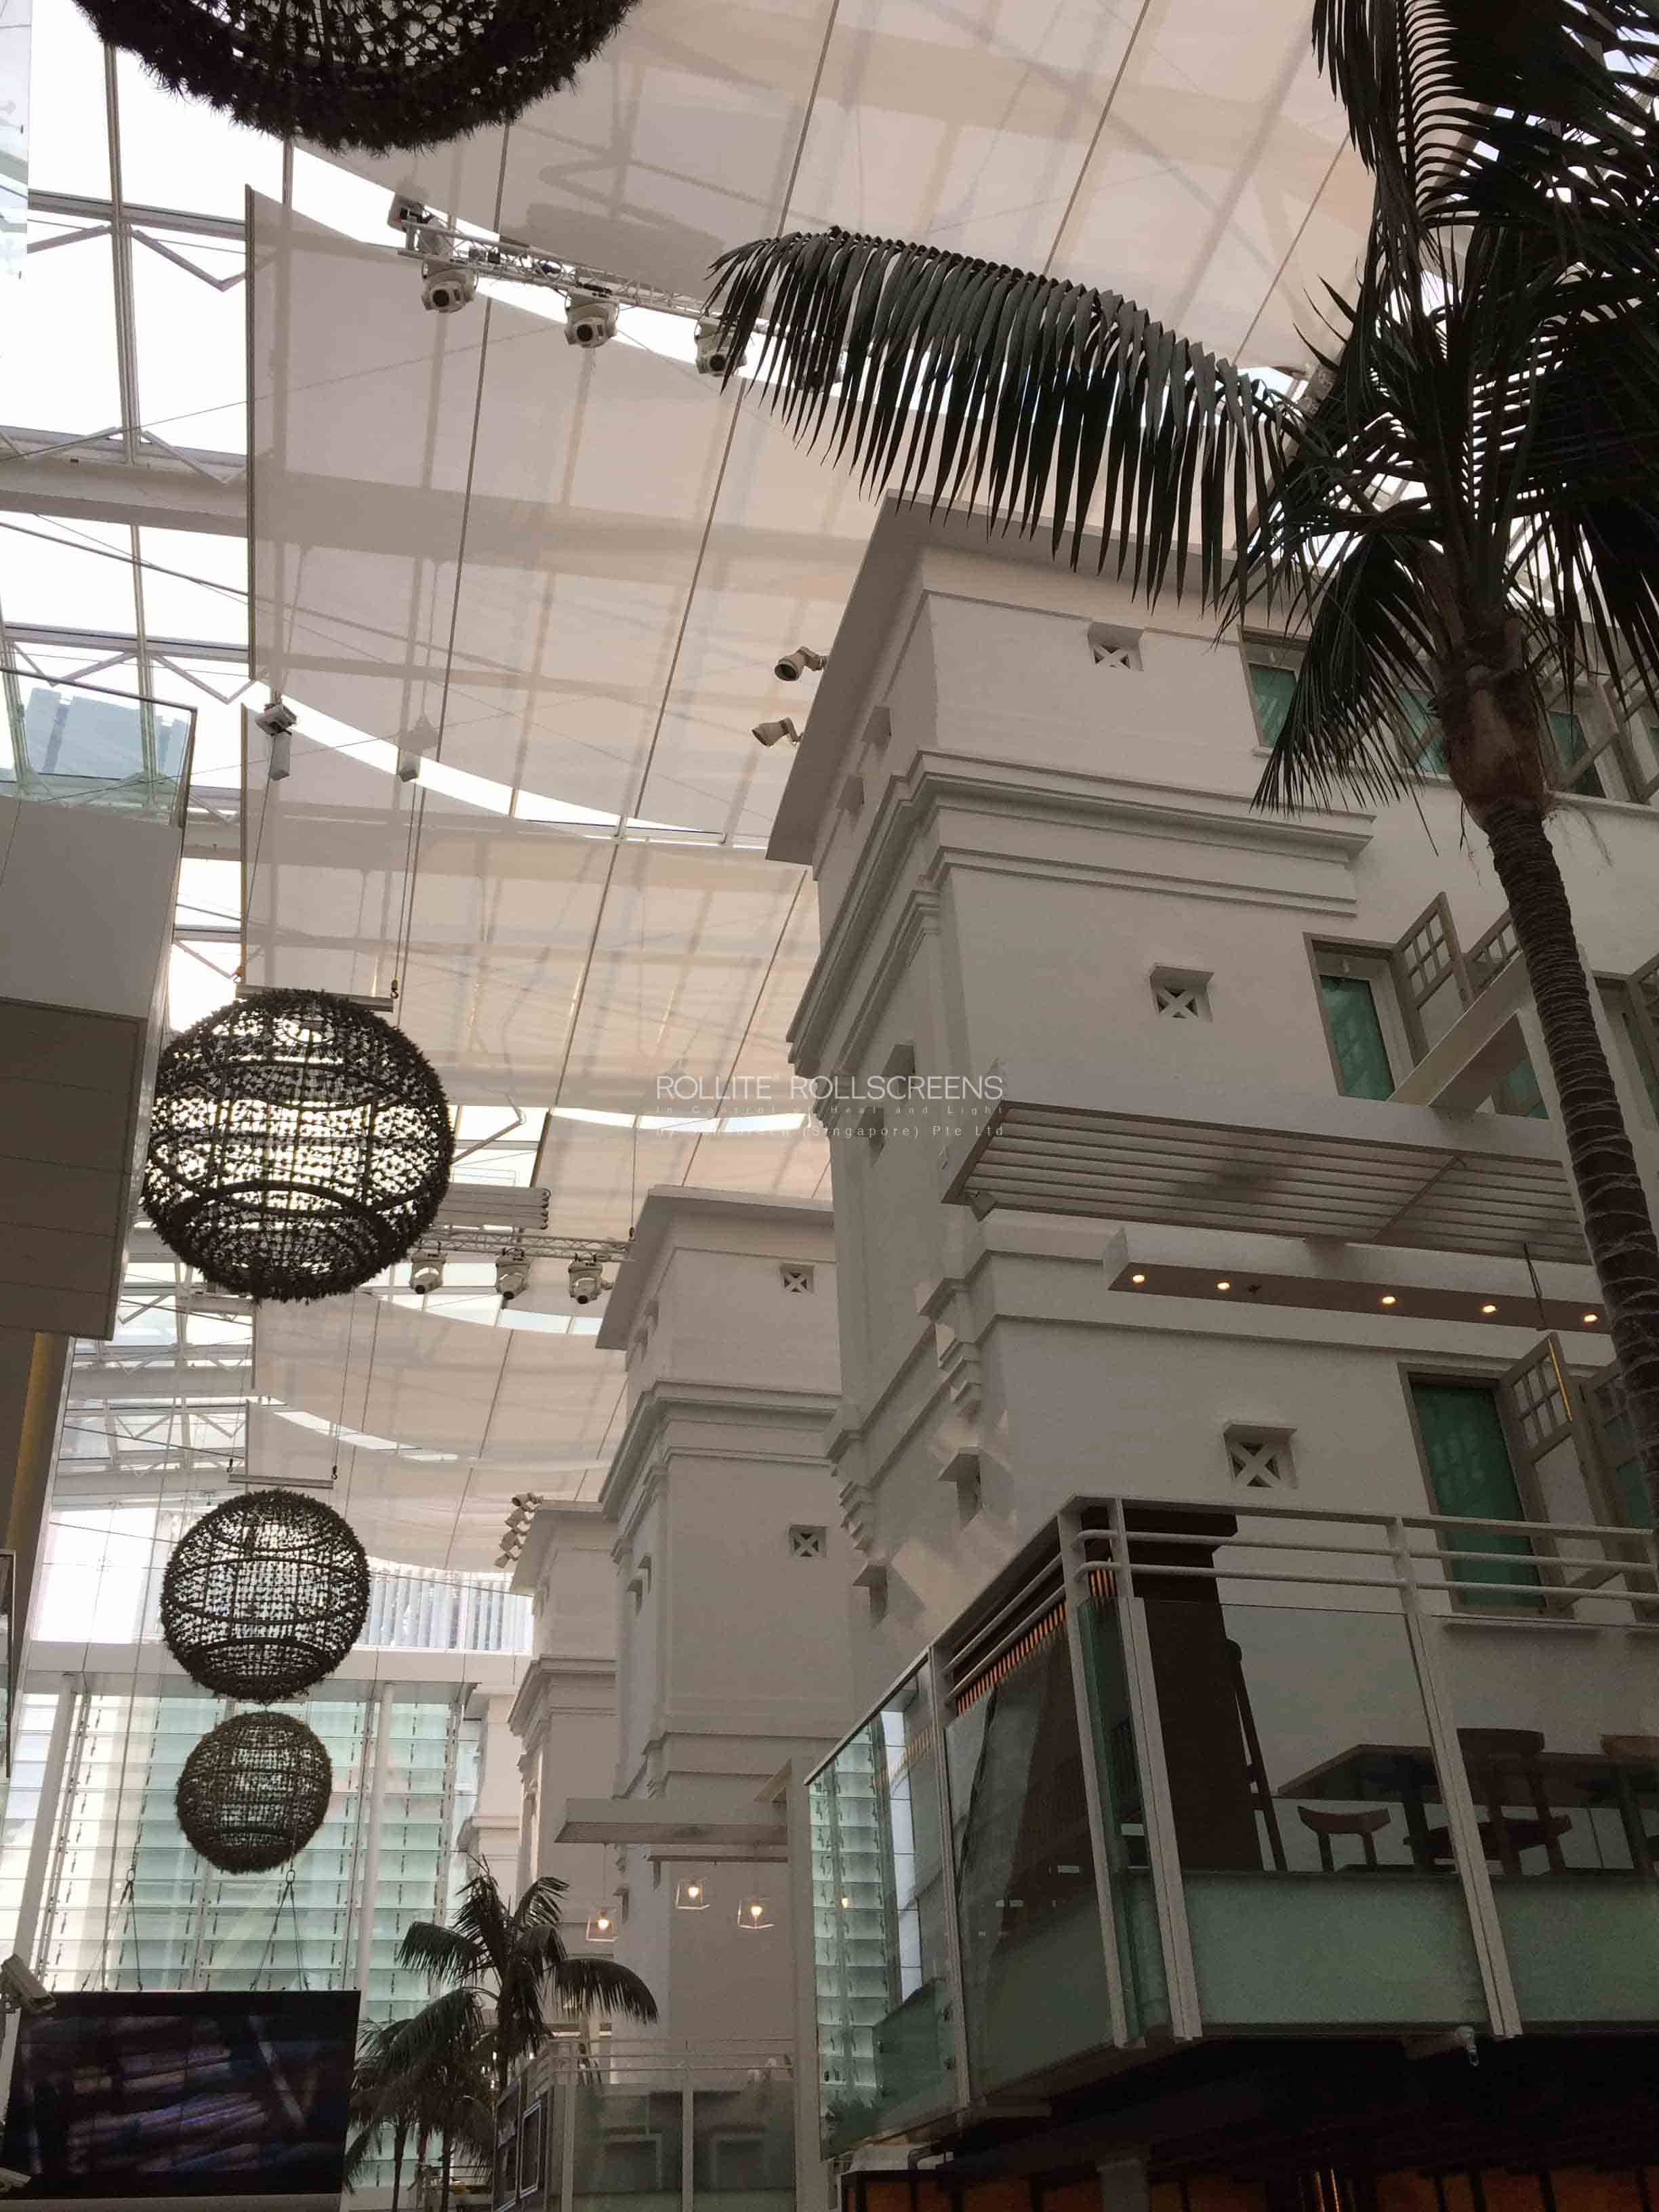 Sunscreen-Singapore_Rollite-Skylight-15